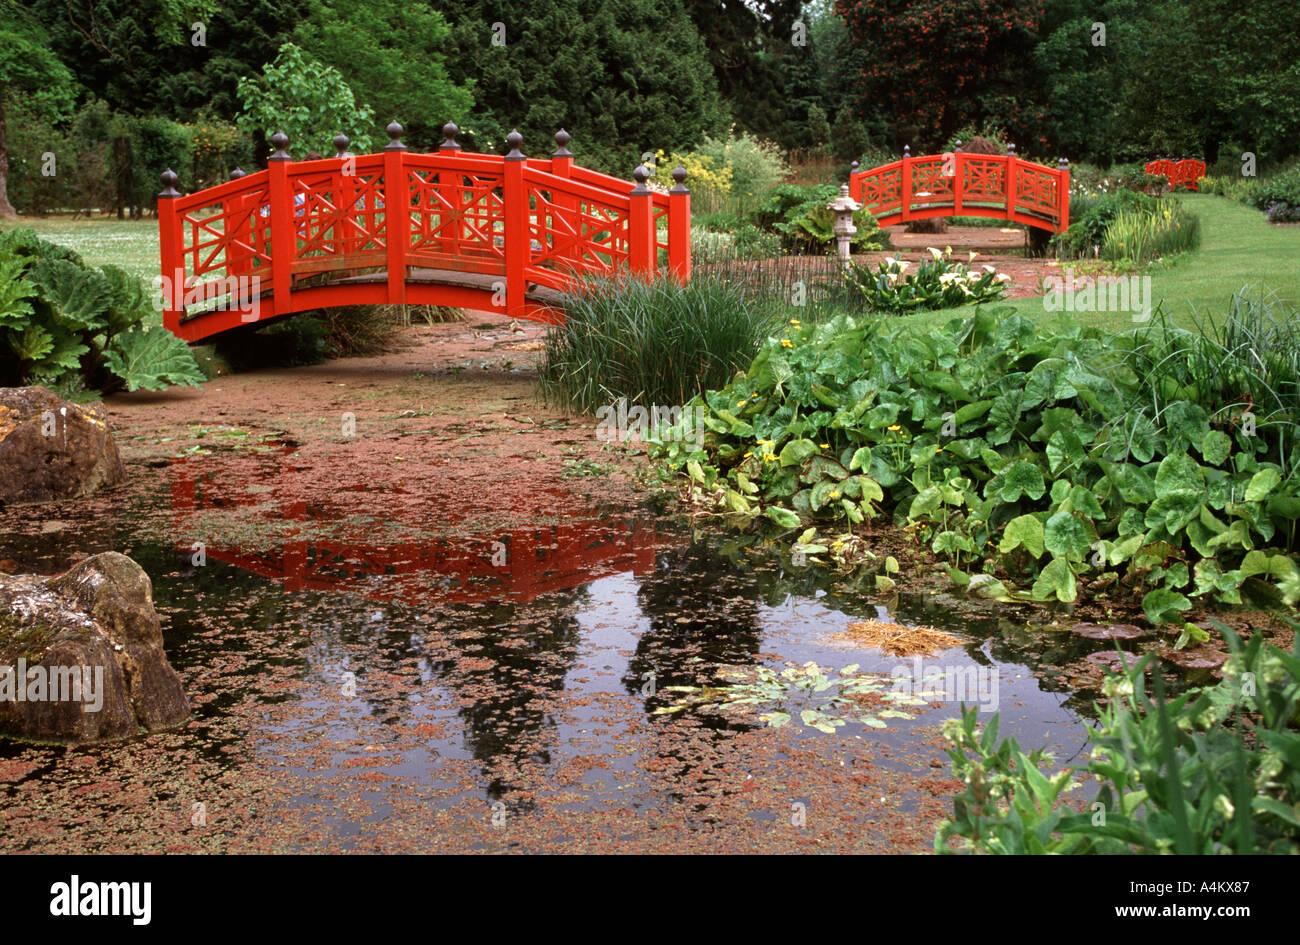 Japanese Style Garden Bridges Japanese Style Wooden Bridges In Water Gardens At Wilton House